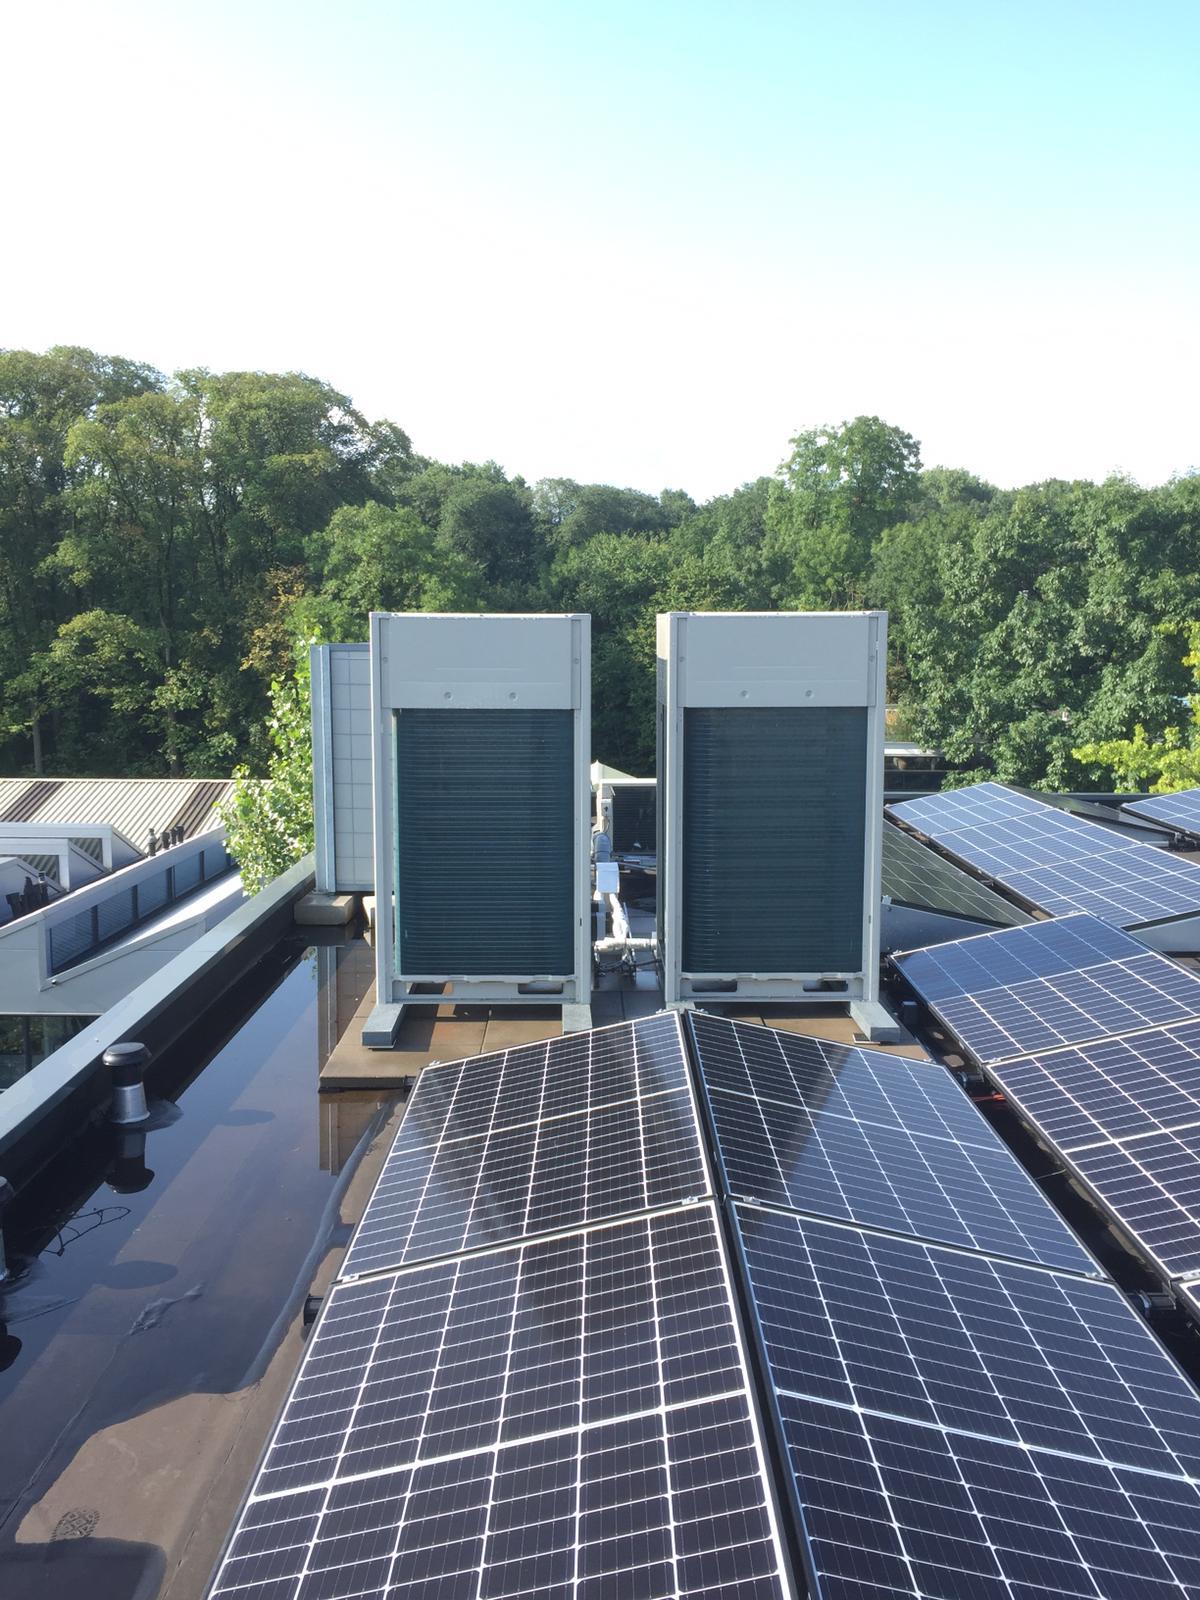 Spruijt Klimaat - Daikin amsterdam VRV systeem Spruijt klimaat